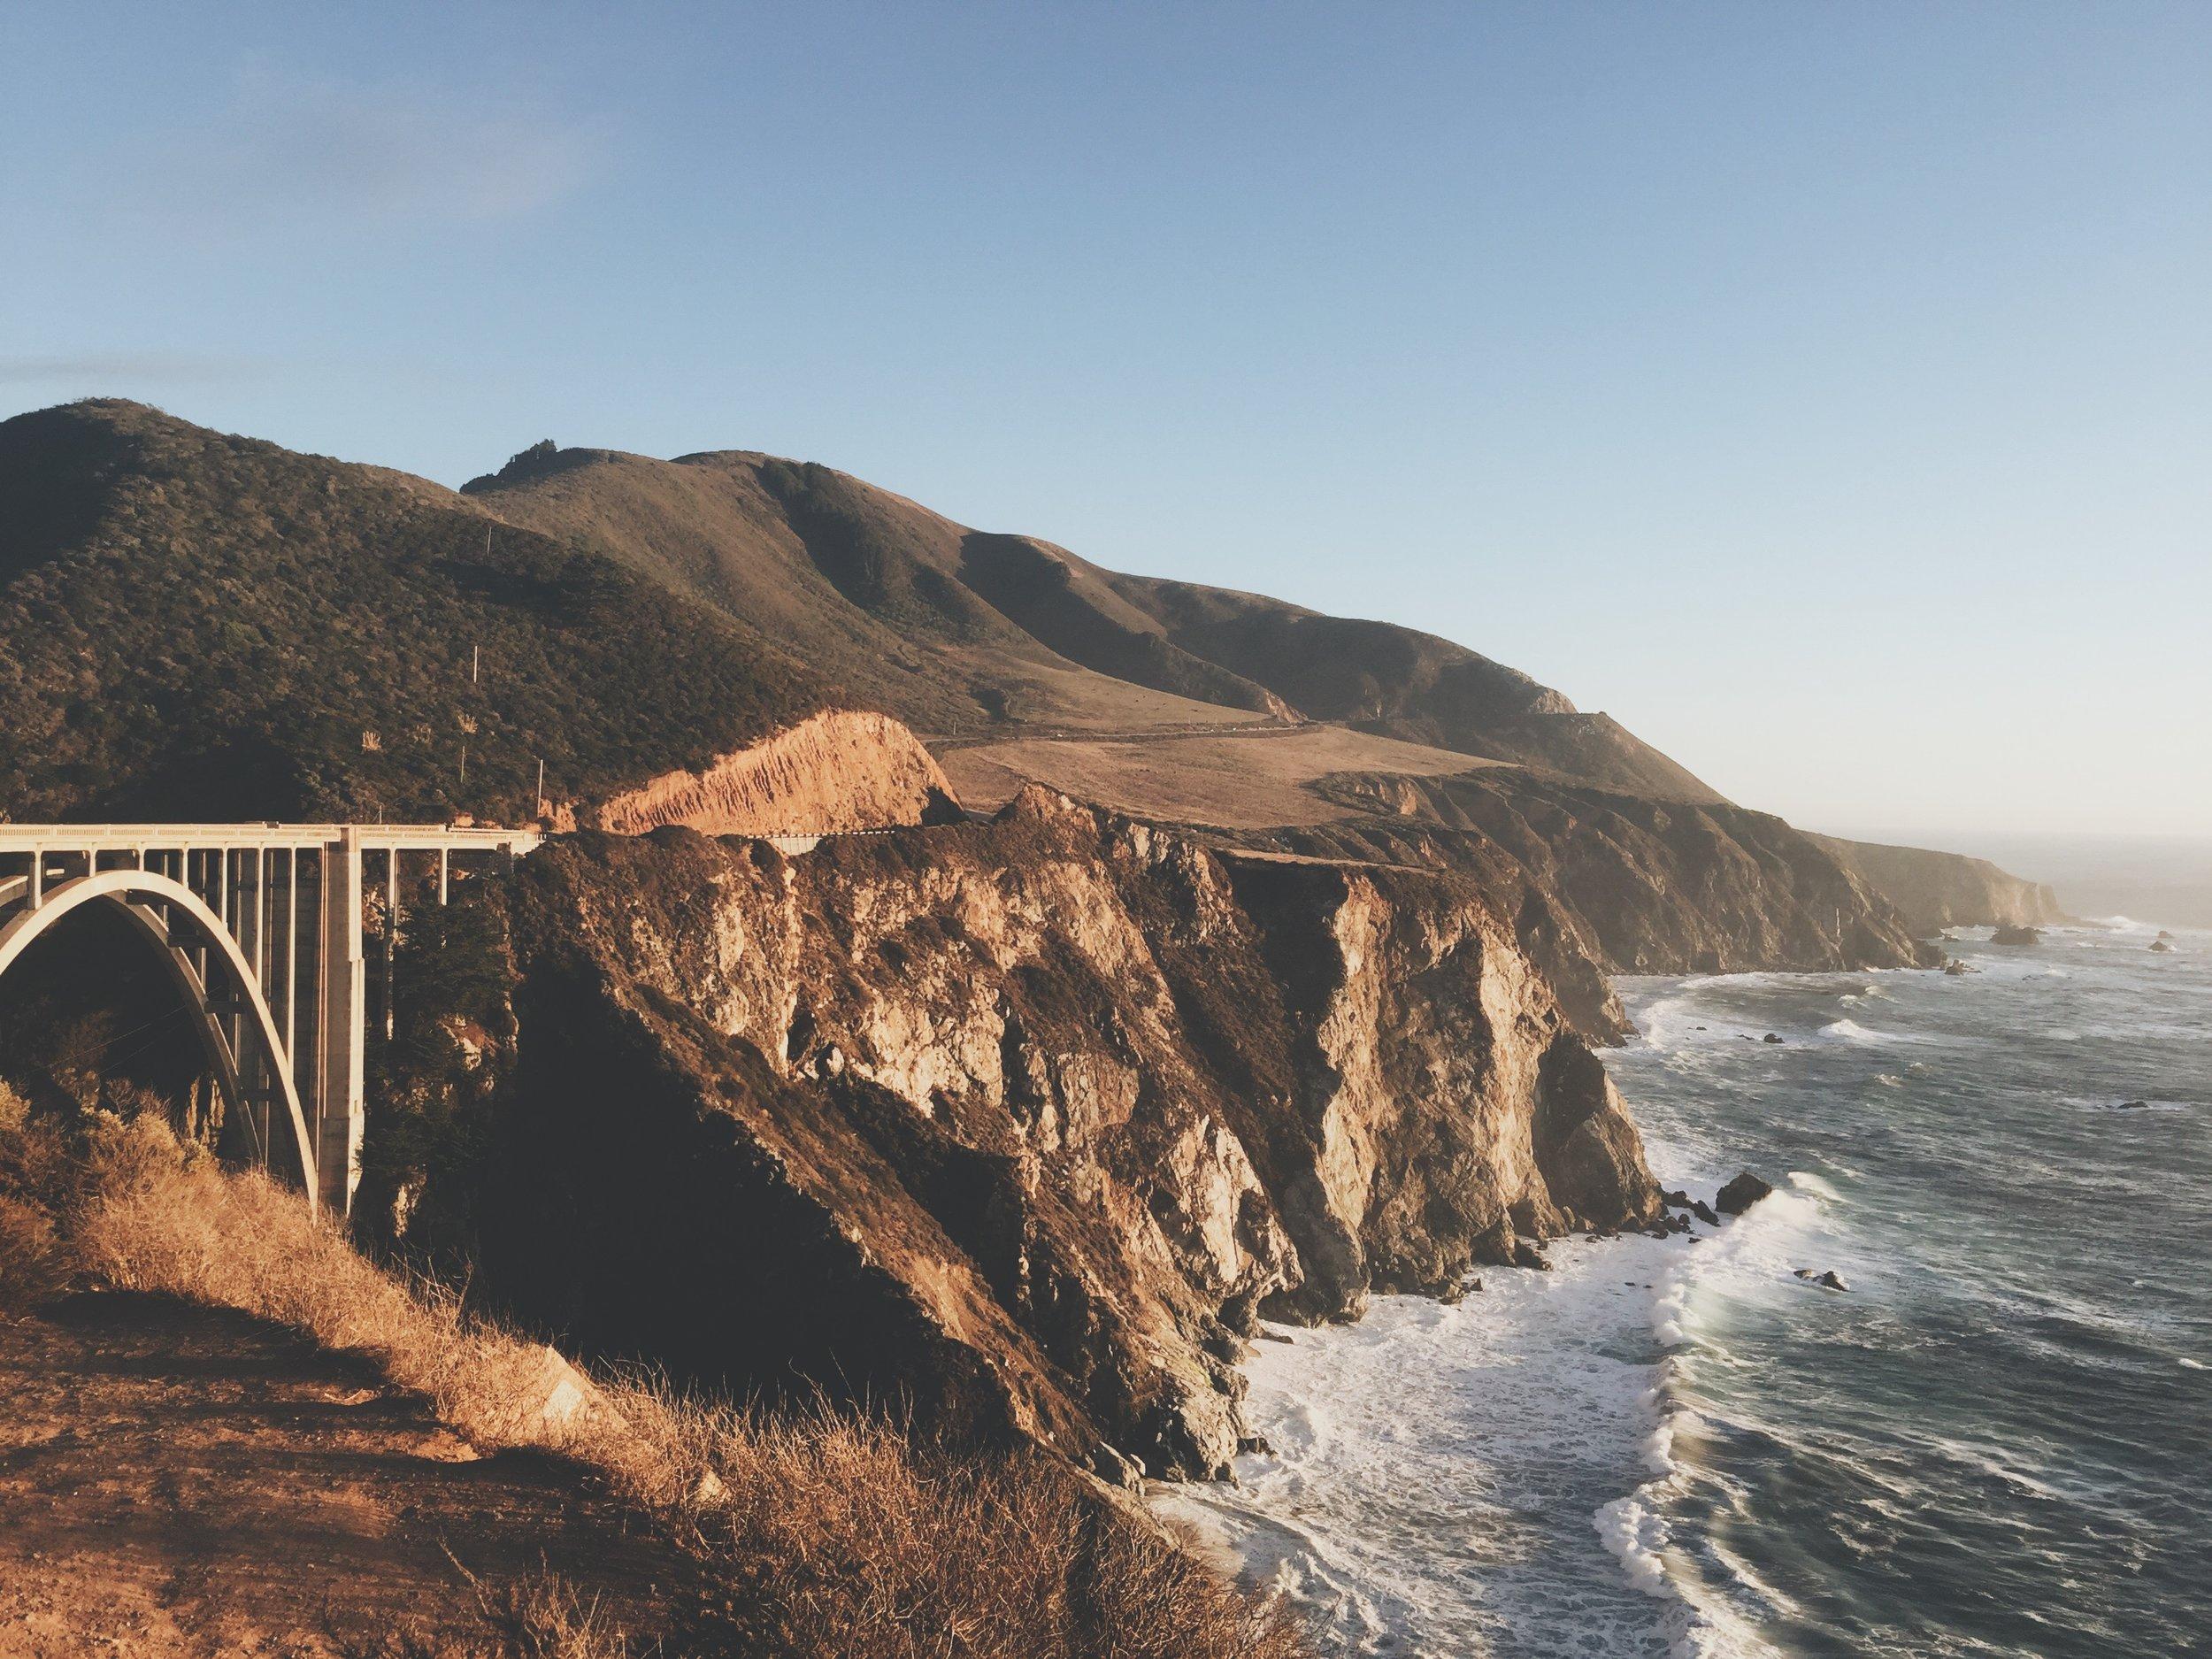 Big Sur California, Bixby Creek Bridge, photo by Ricky Stephens of A Modern Villain